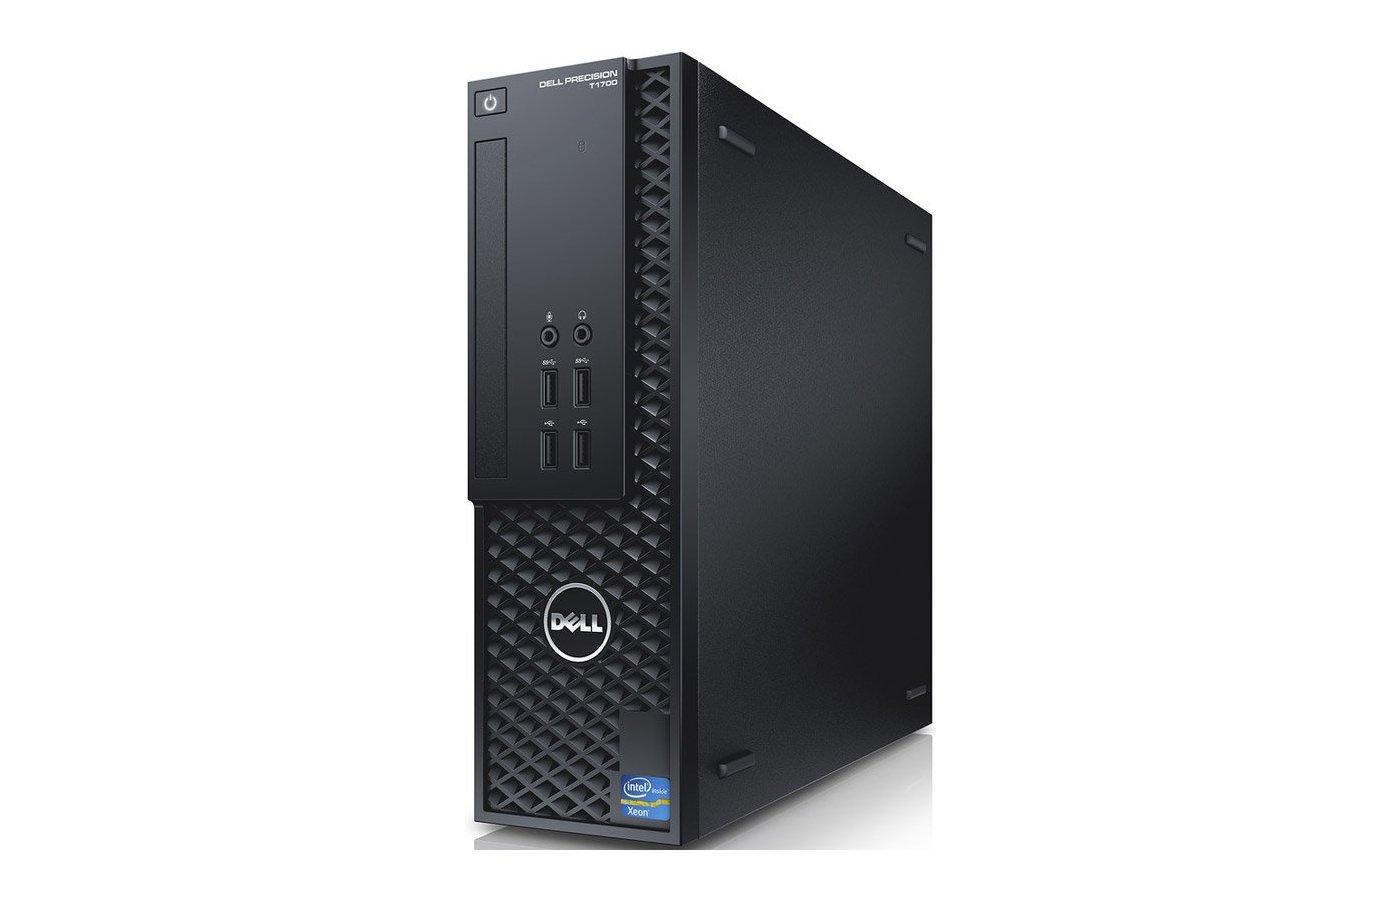 Системный блок Dell PRECISION T1700 /1700-9007/